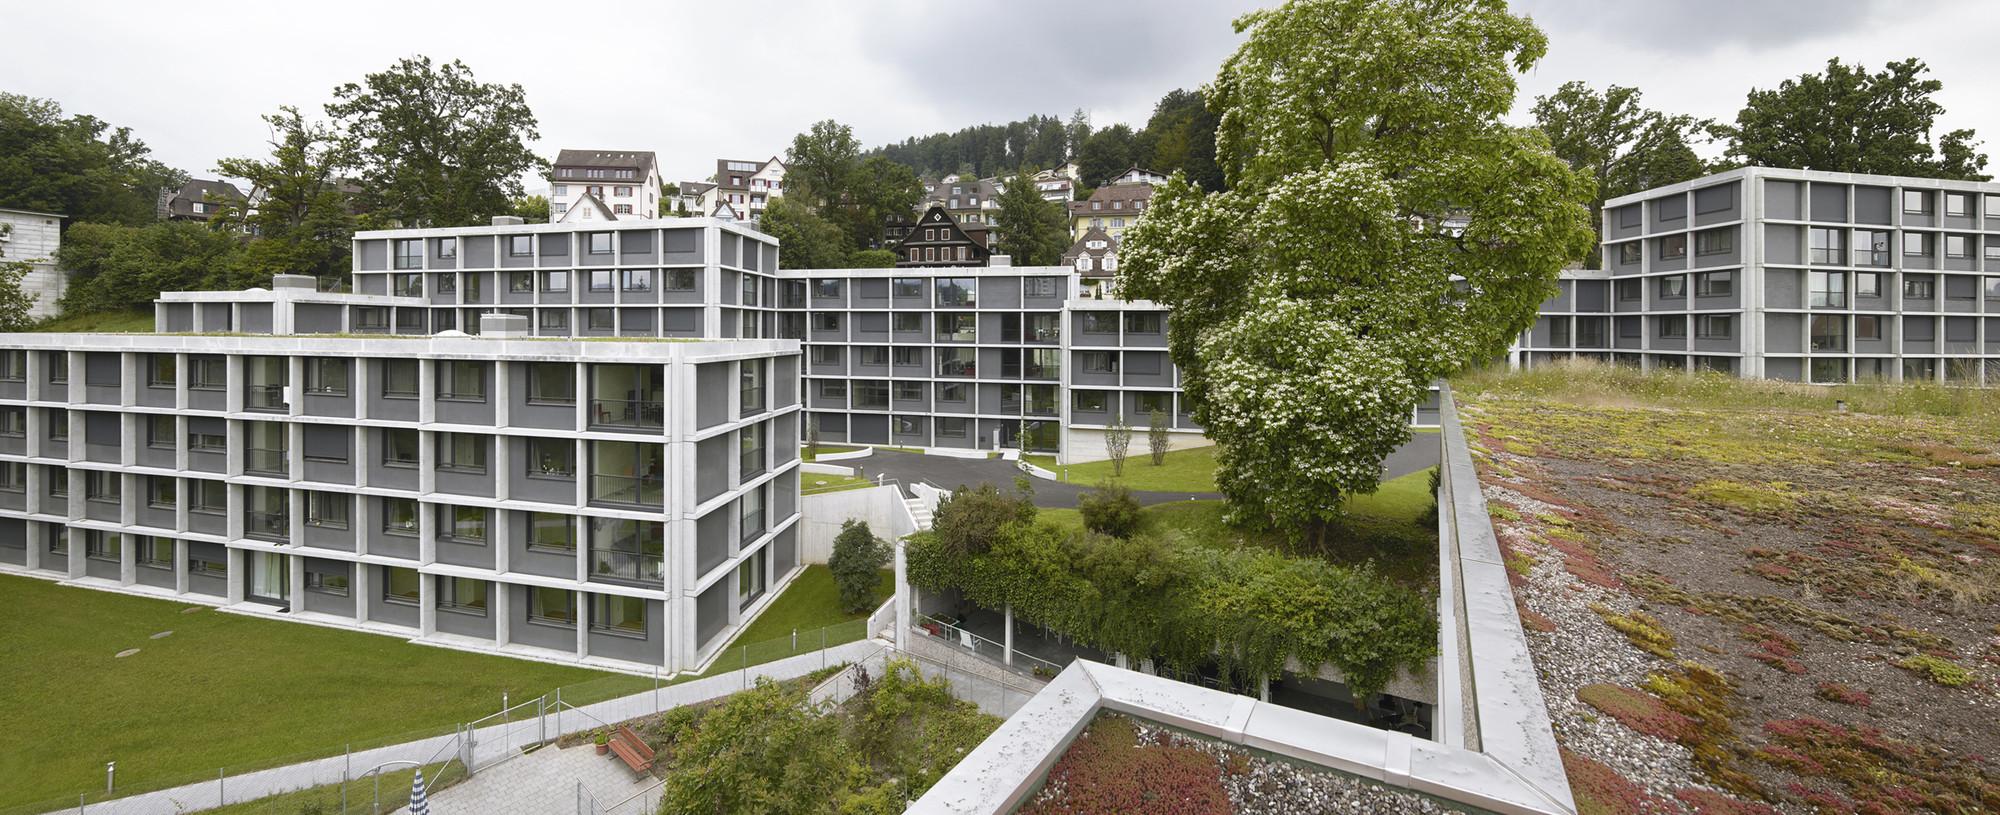 Apartamentos de Estudiantes en Lucerna / Durisch + Nolli Architetti, © Walter Mair